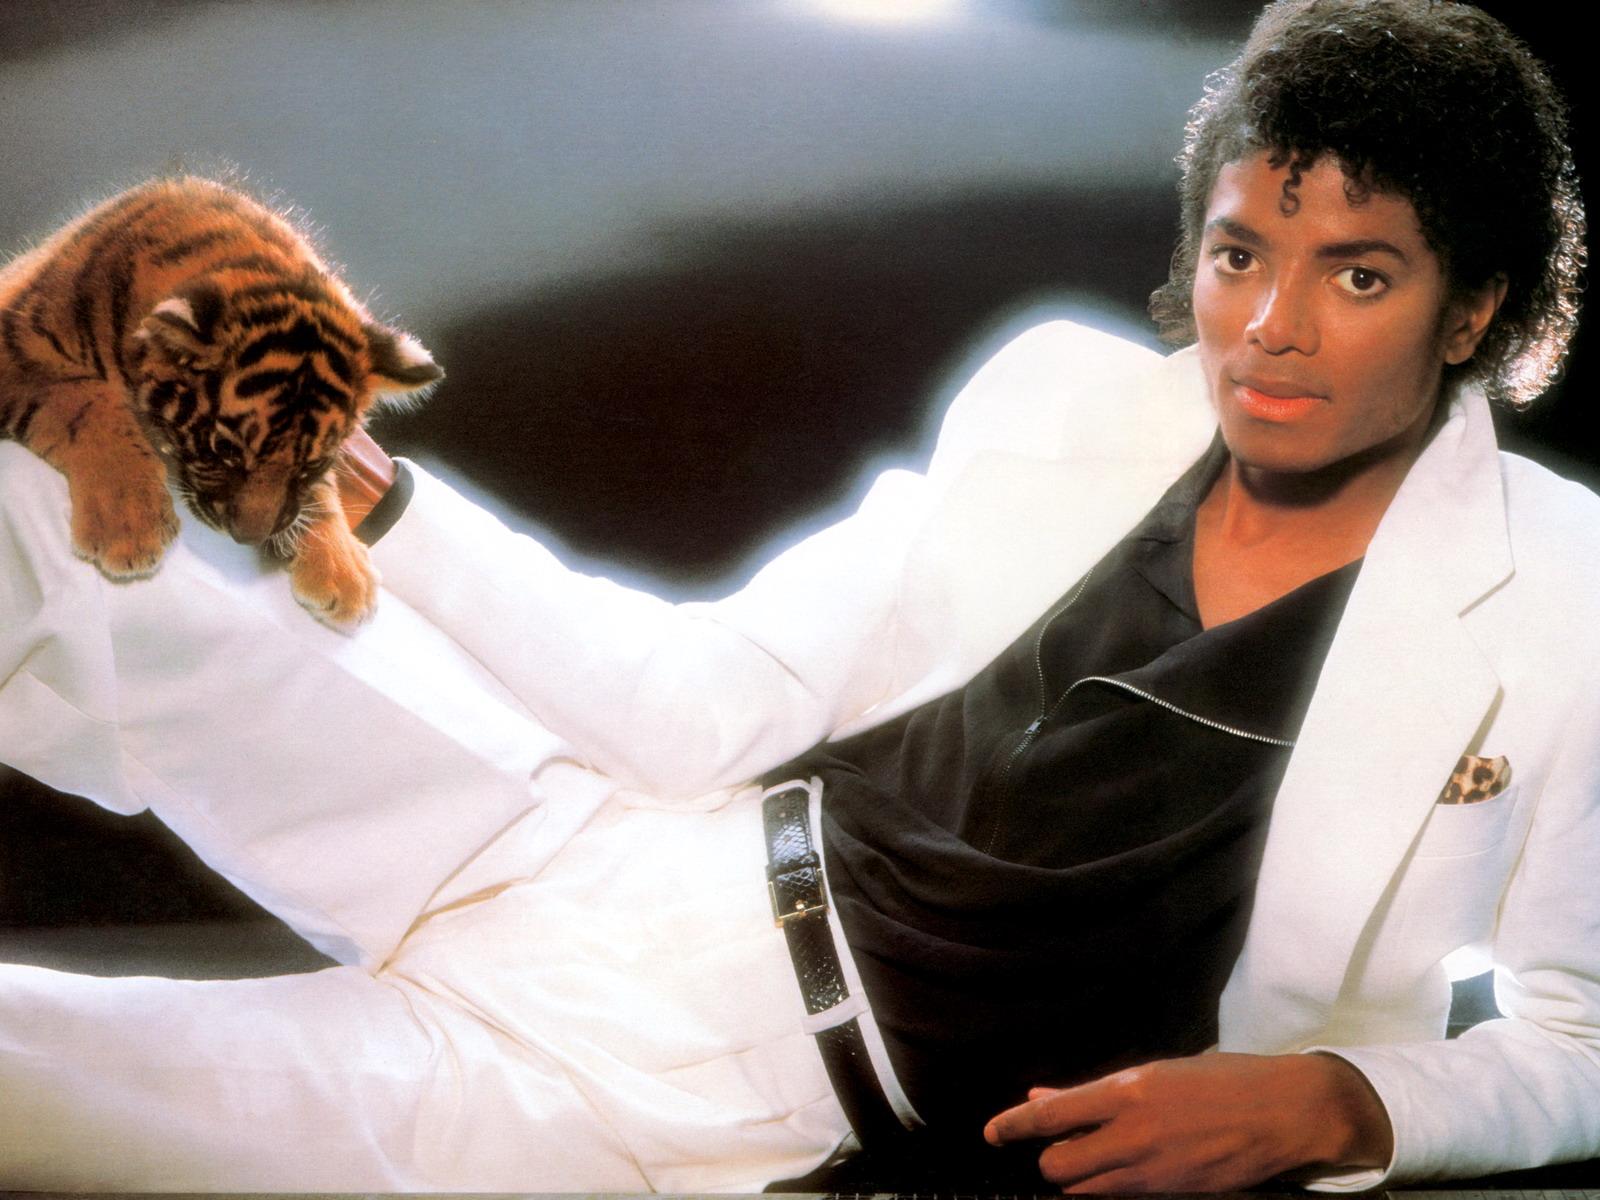 http://st.kinopoisk.ru/im/wallpaper/9/7/4/kinopoisk.ru-Michael-Jackson-974954--w--1600.jpg